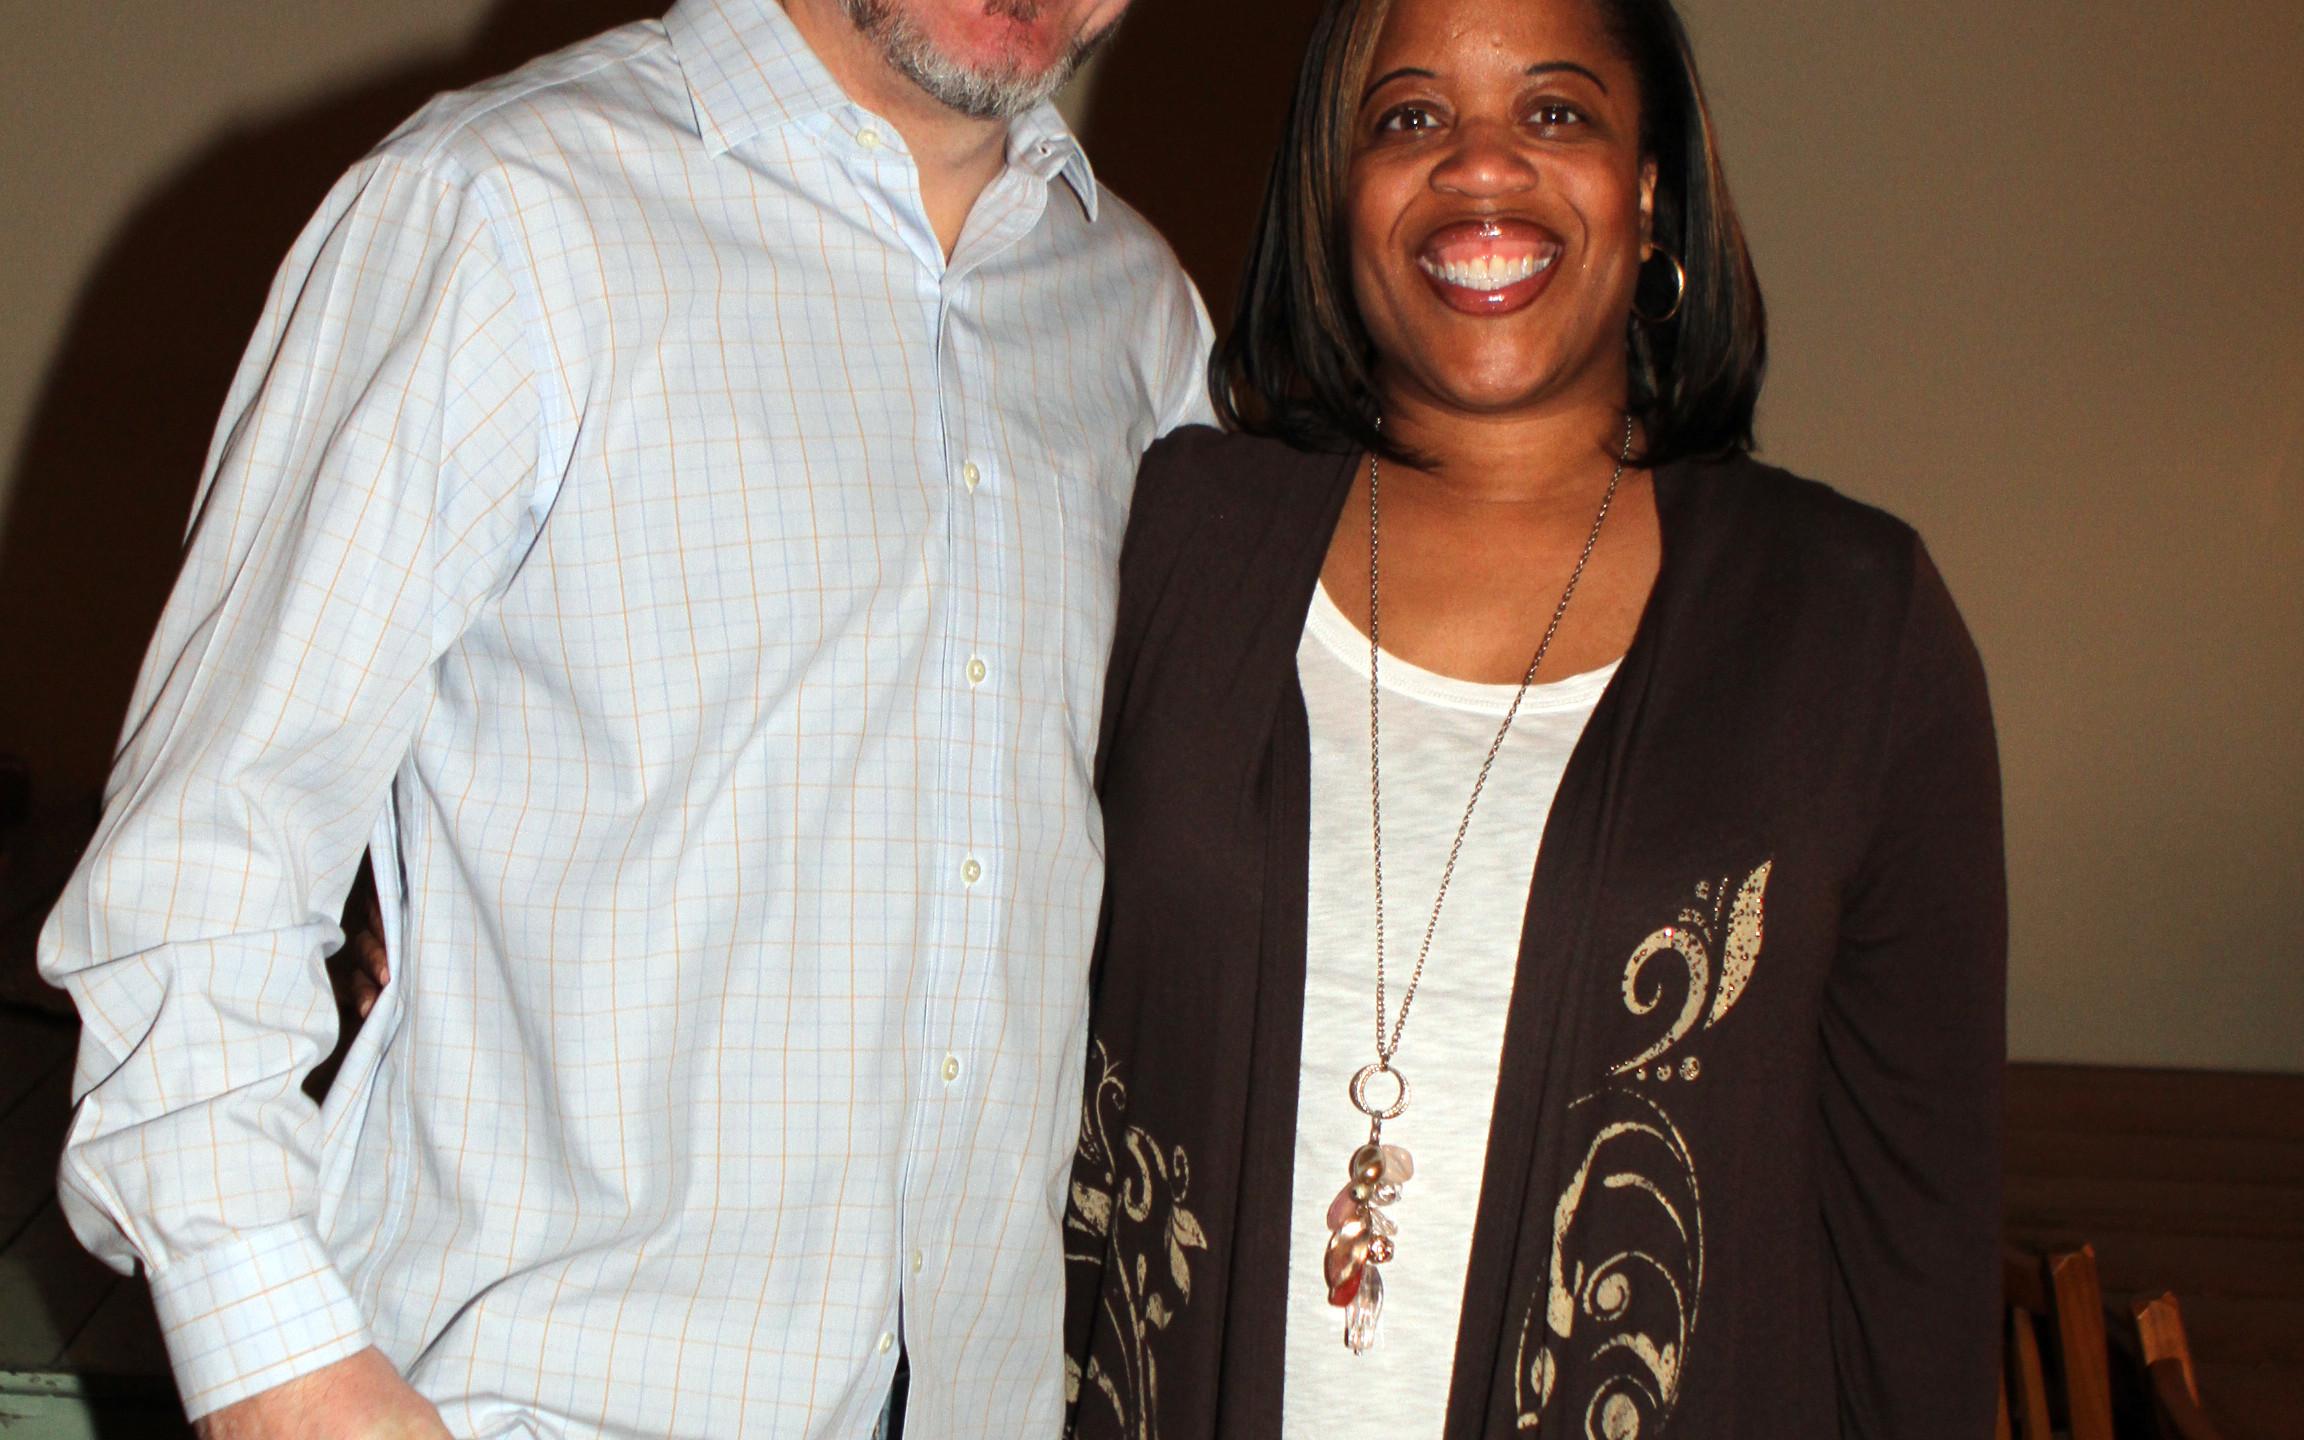 Christopher & Jerica Swiger